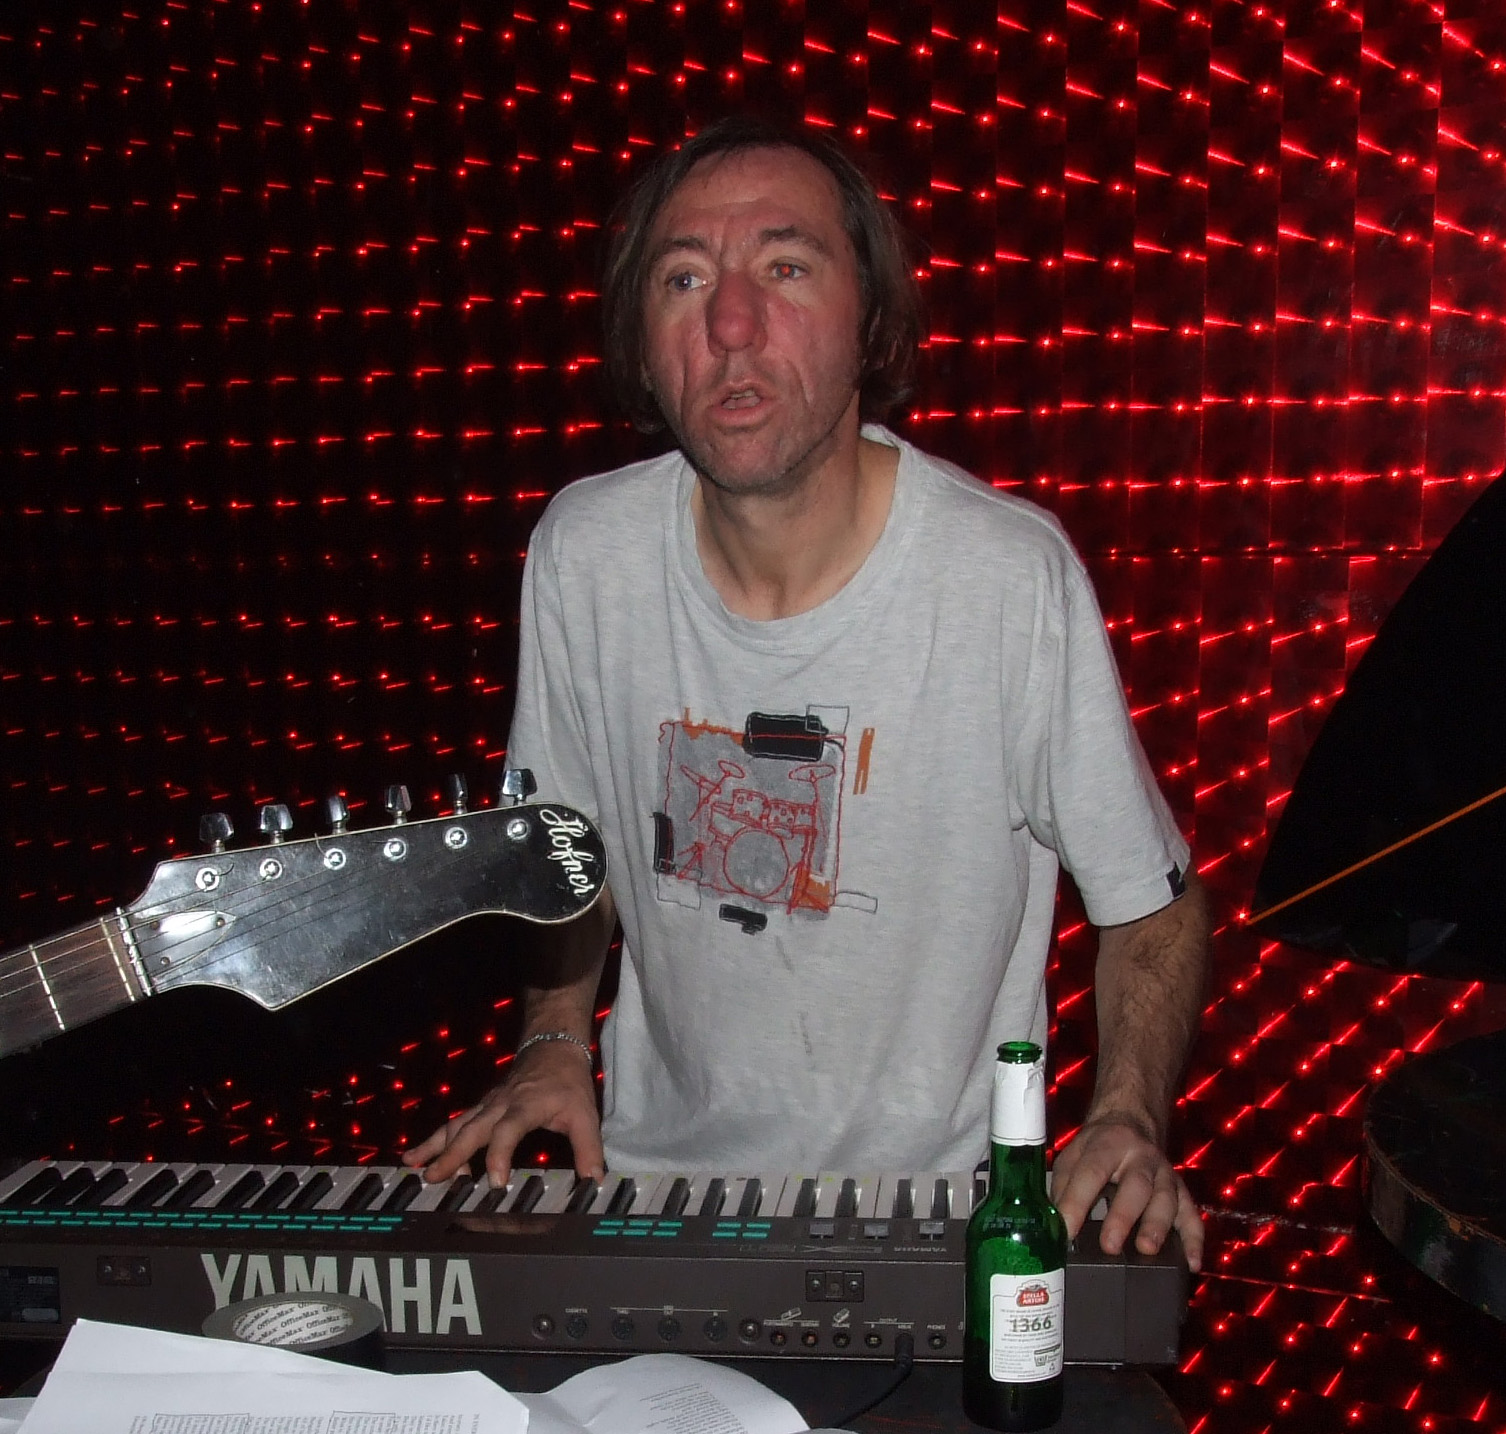 Bob Brannigan - I can't believe its not Eno!